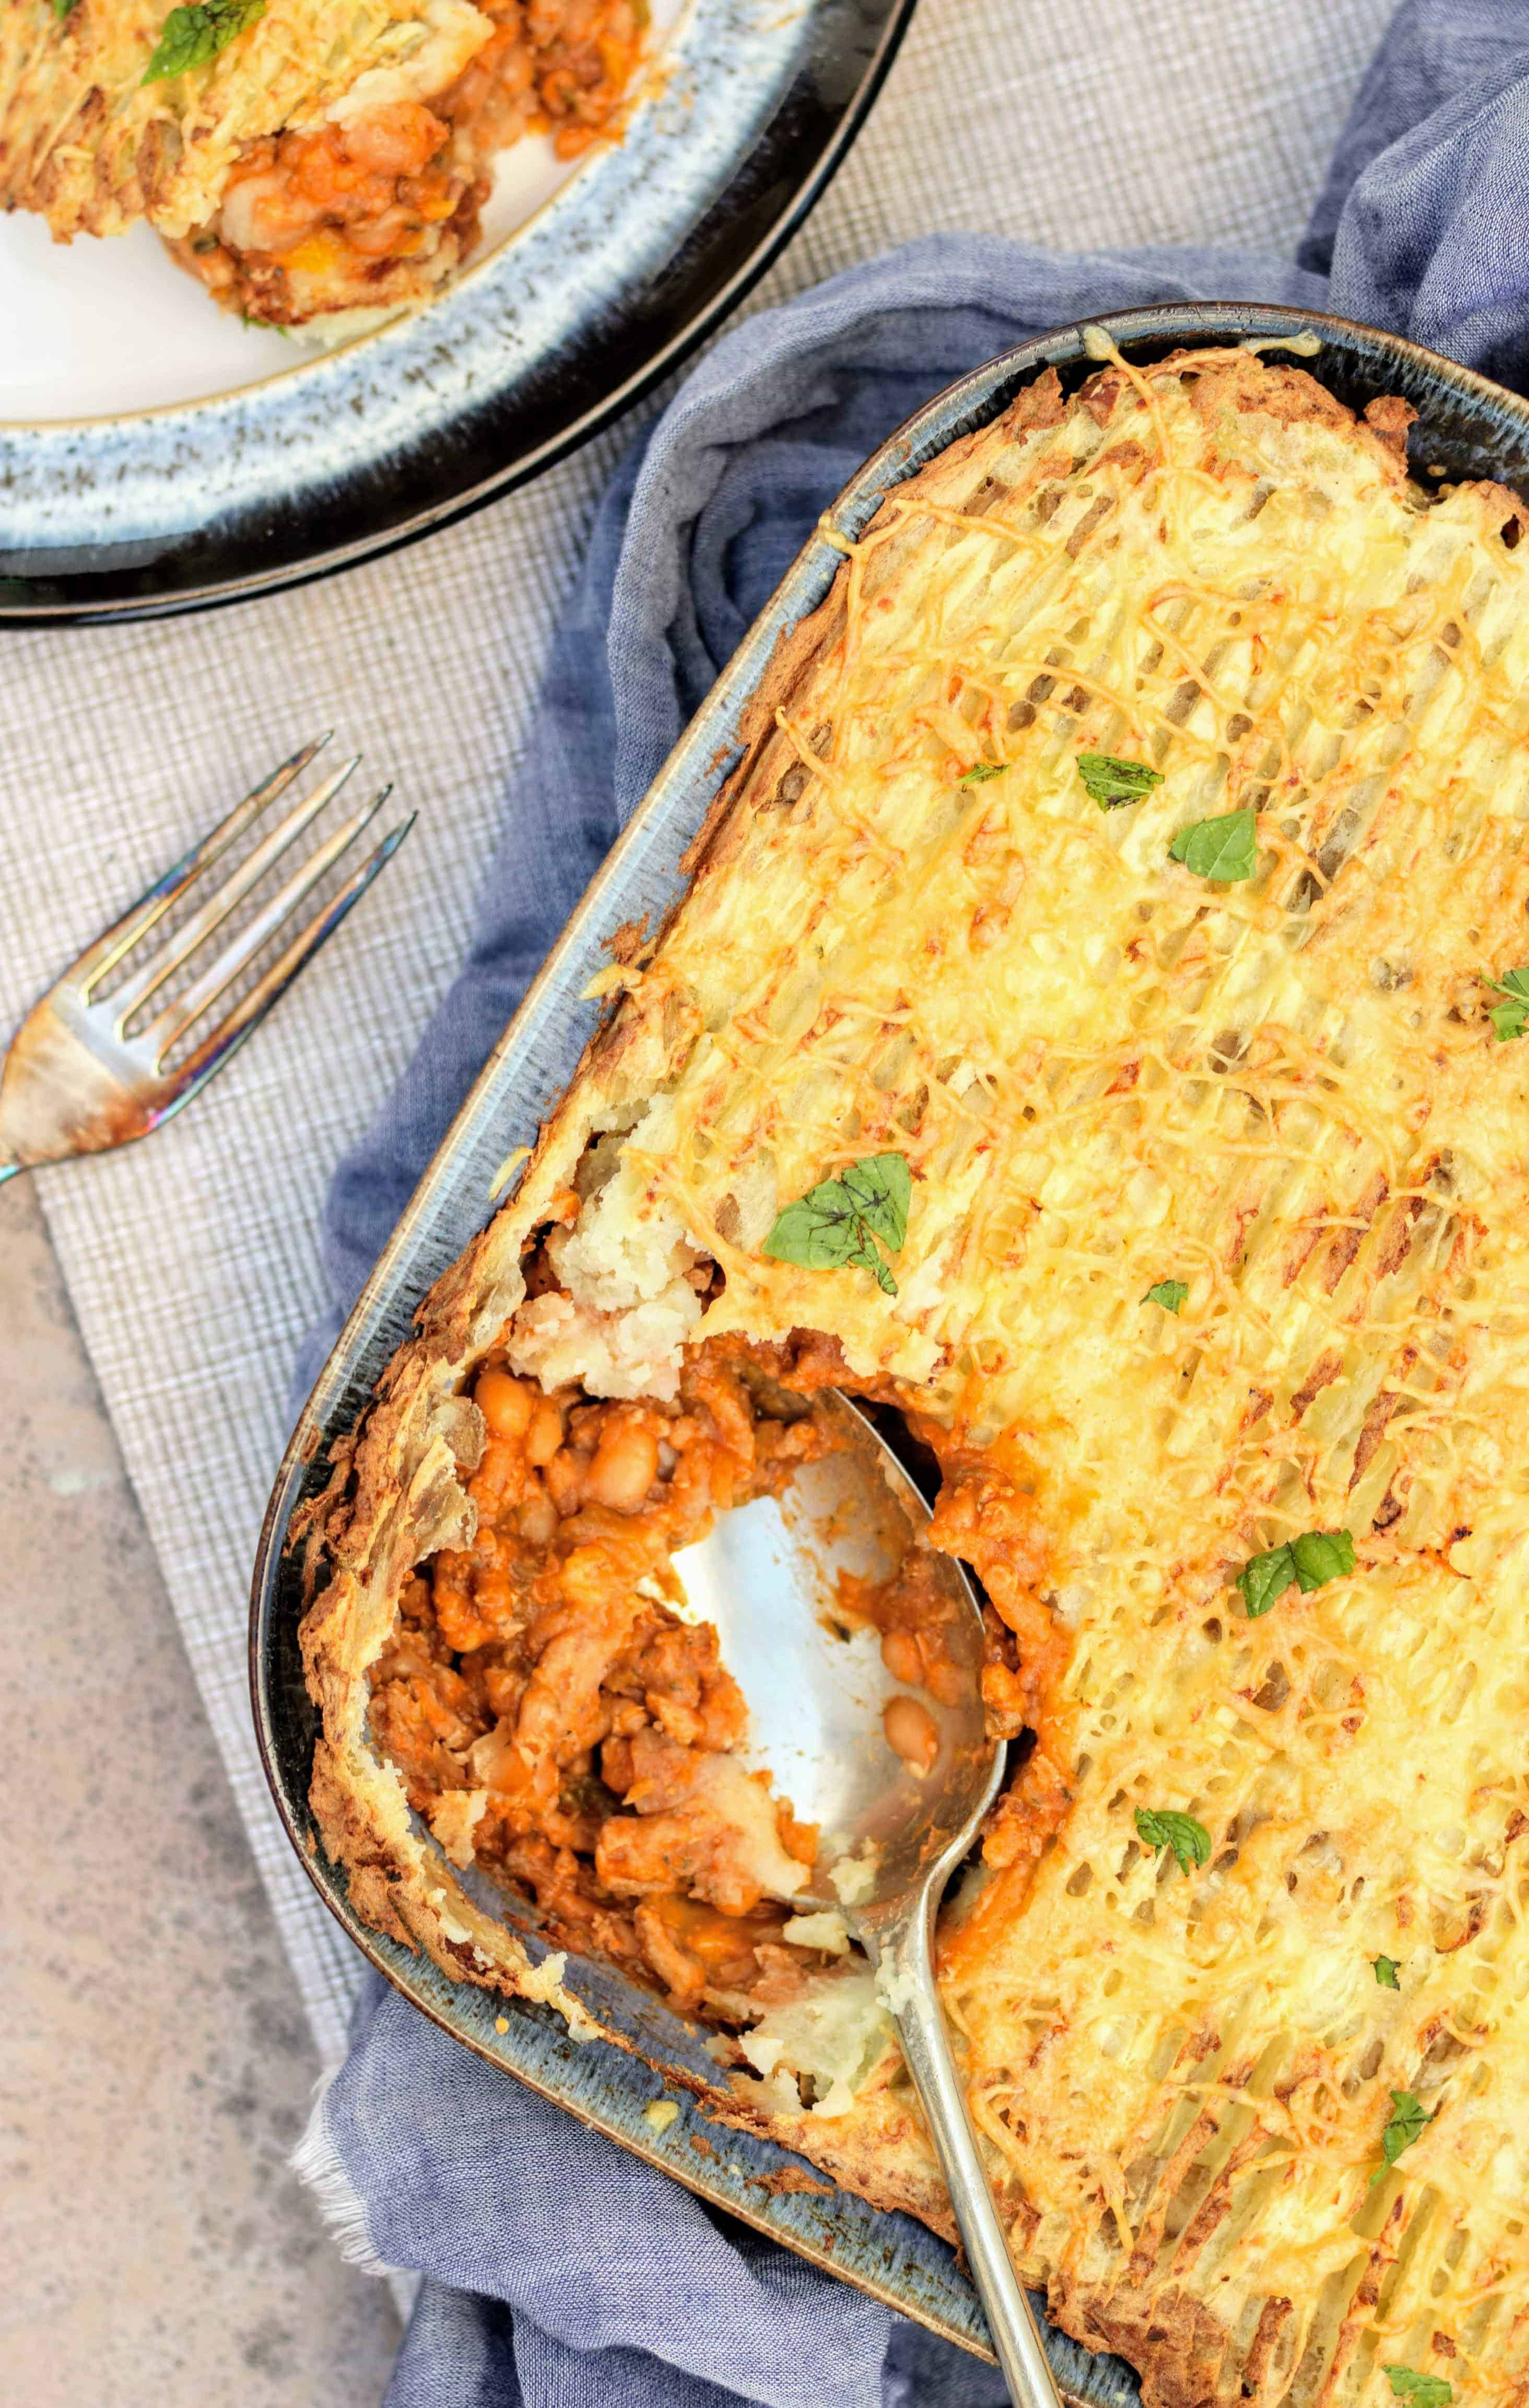 Slimming World Syn Free Pork & Bean Slow Cooker Cottage Pie